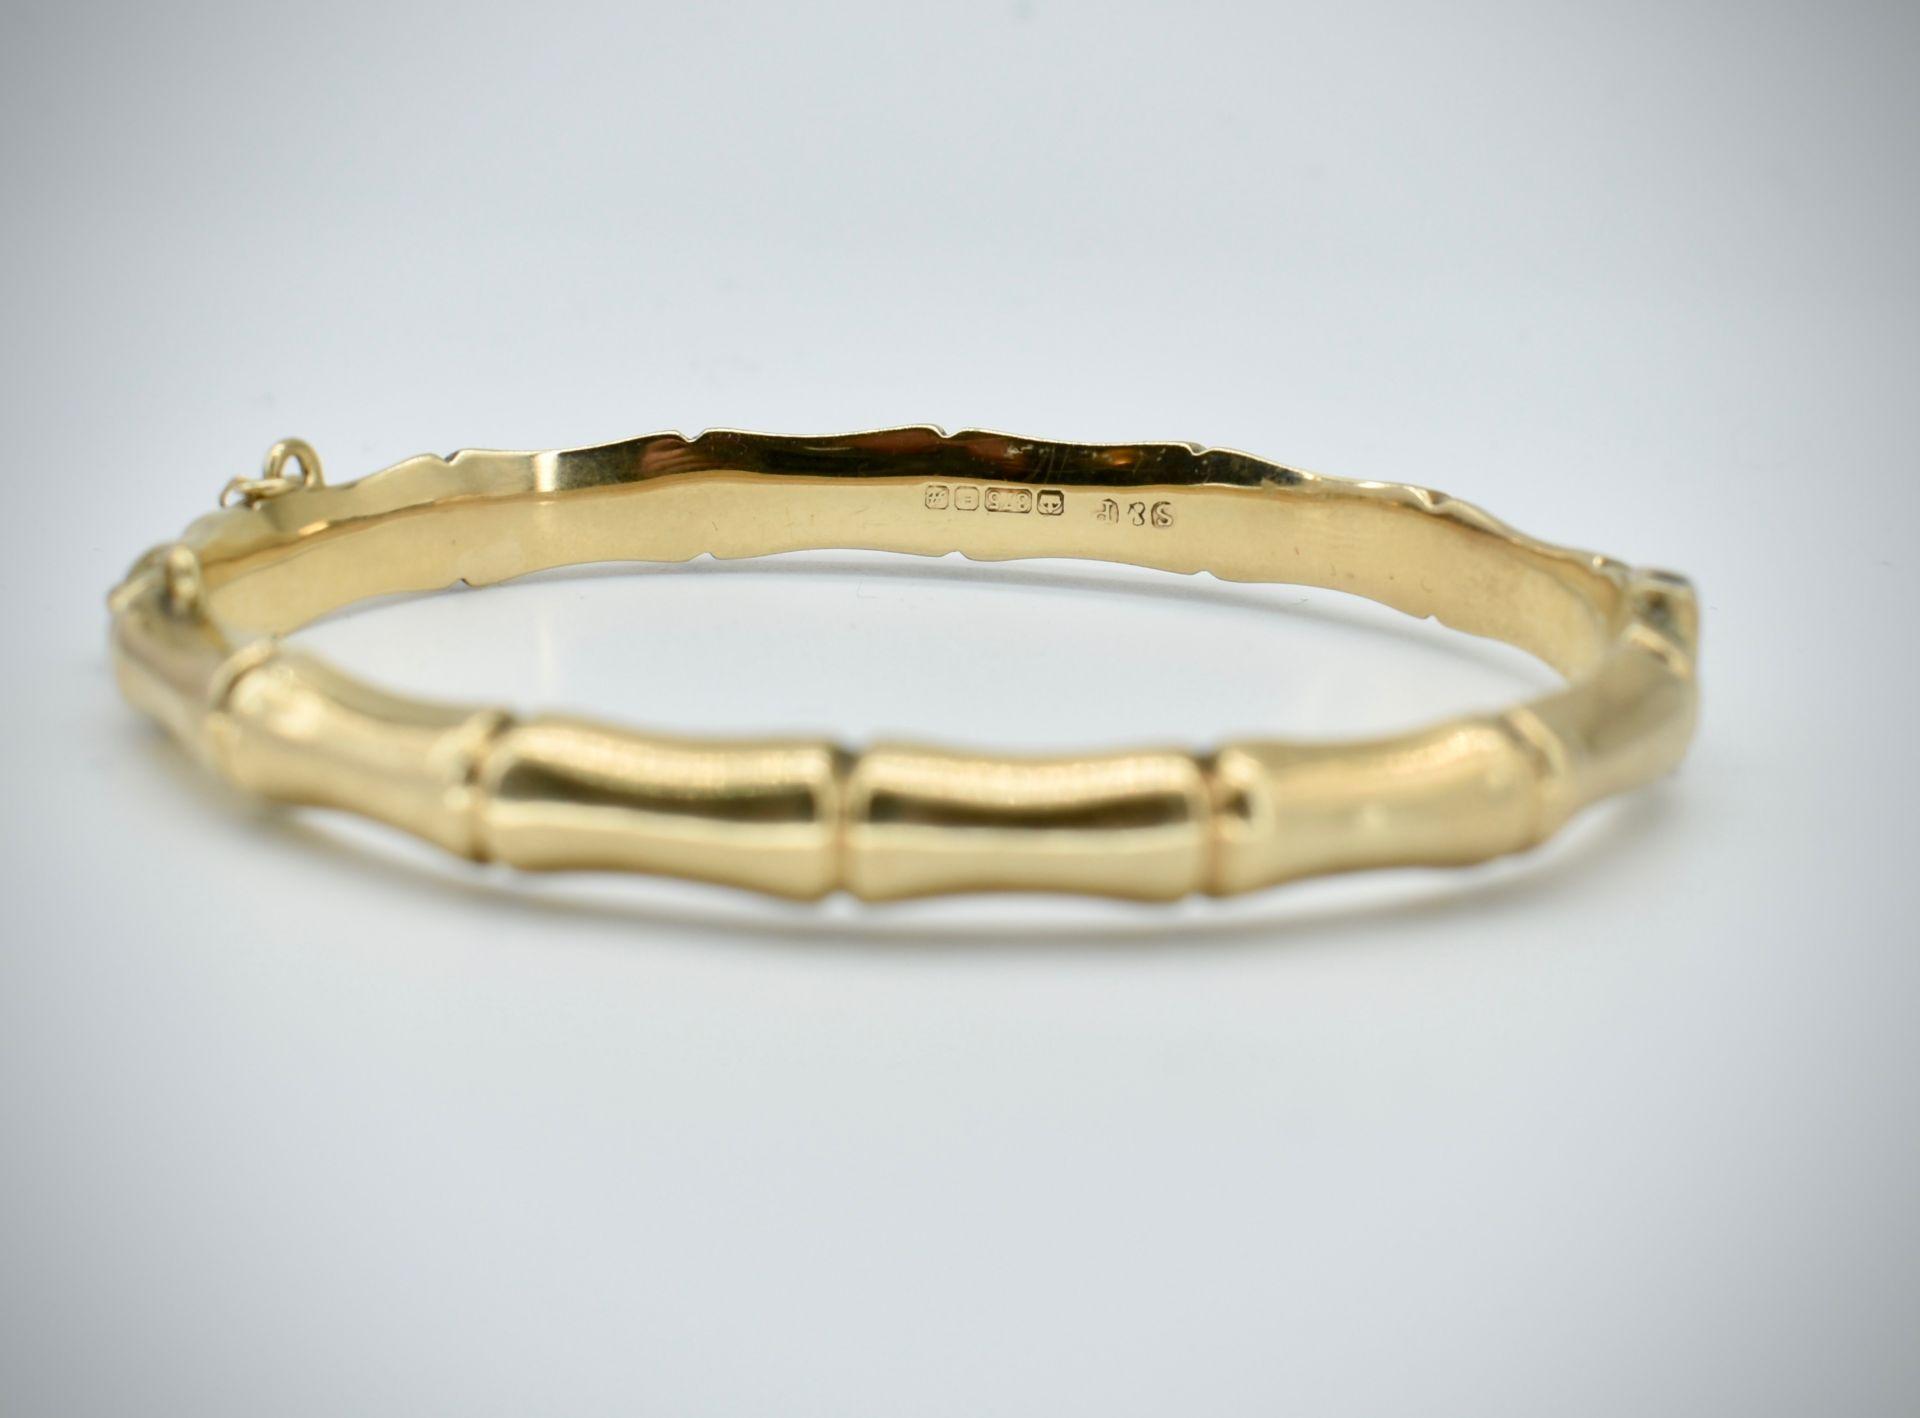 Hallmarked 9ct Gold Bangle - Image 2 of 5